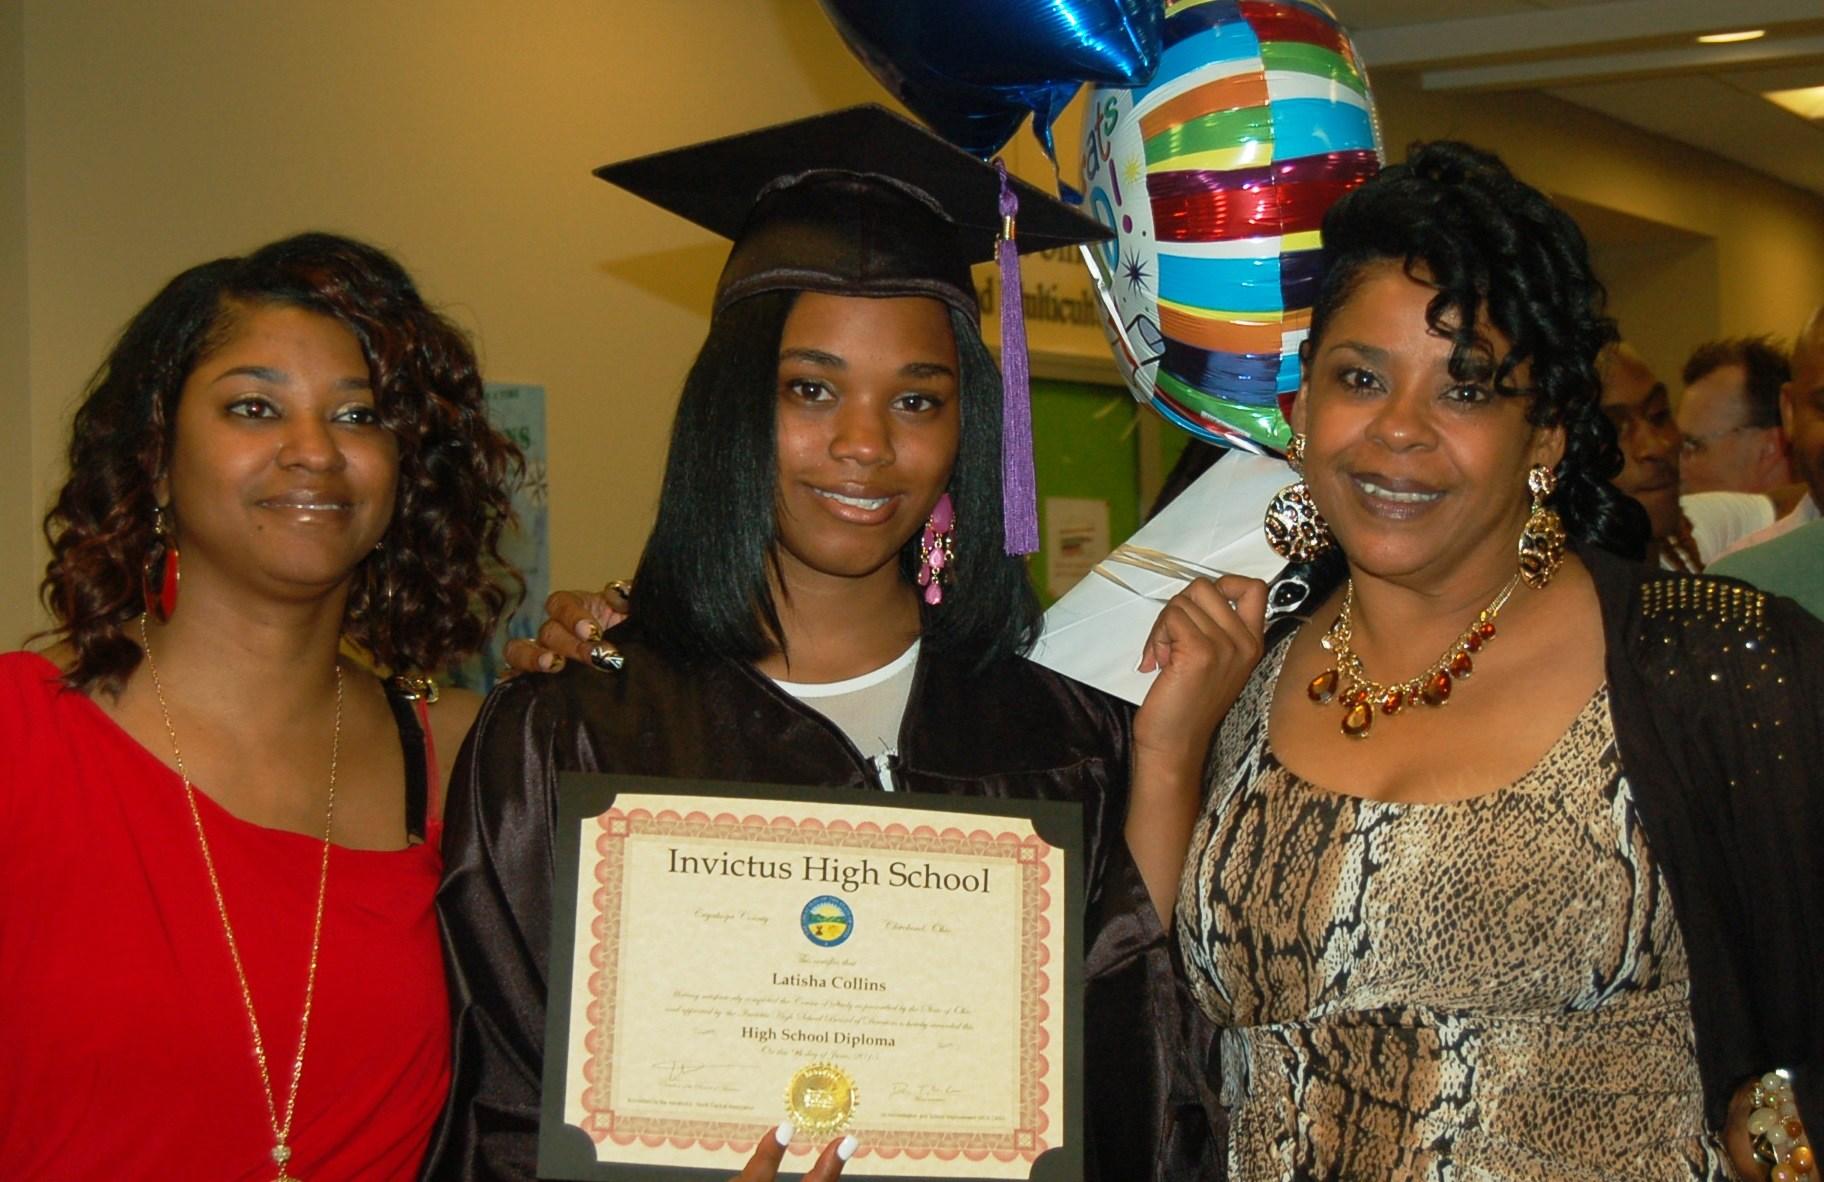 Invictus High School Cleveland, Ohio Graduation Diploma